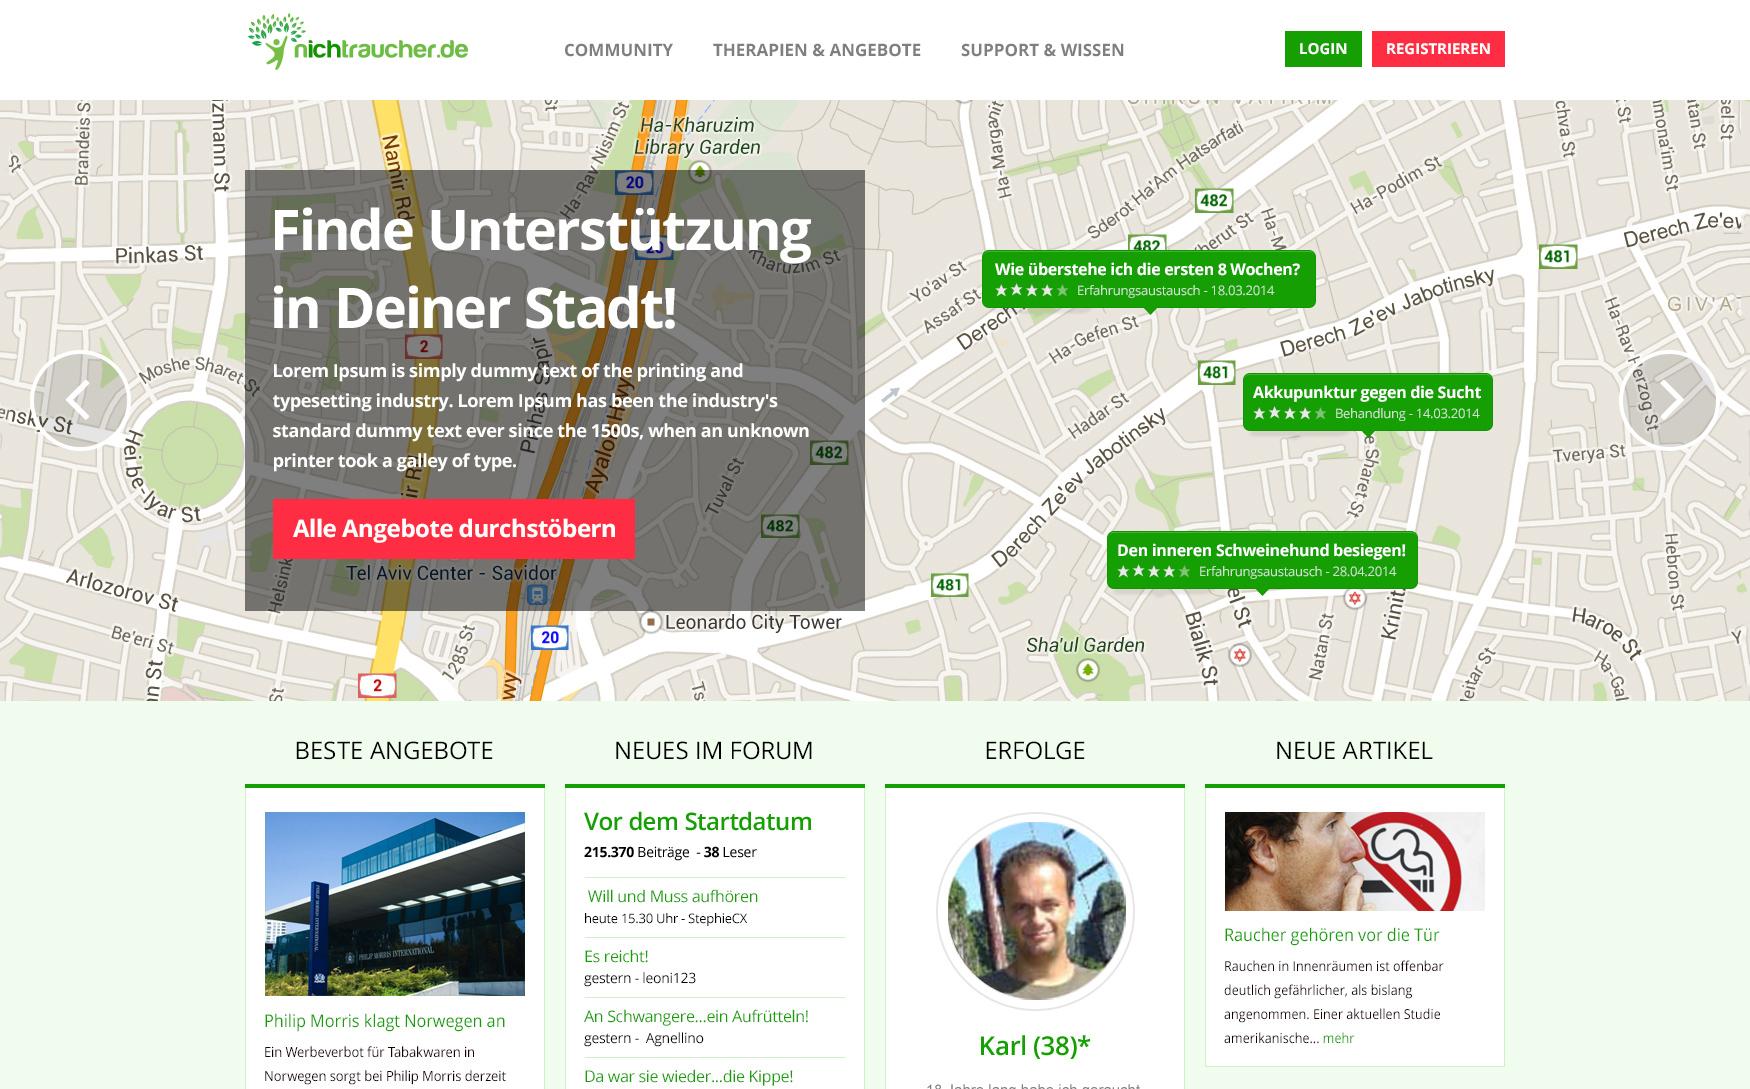 nichtraucher.de Expands Its Team and Presents Its New Design